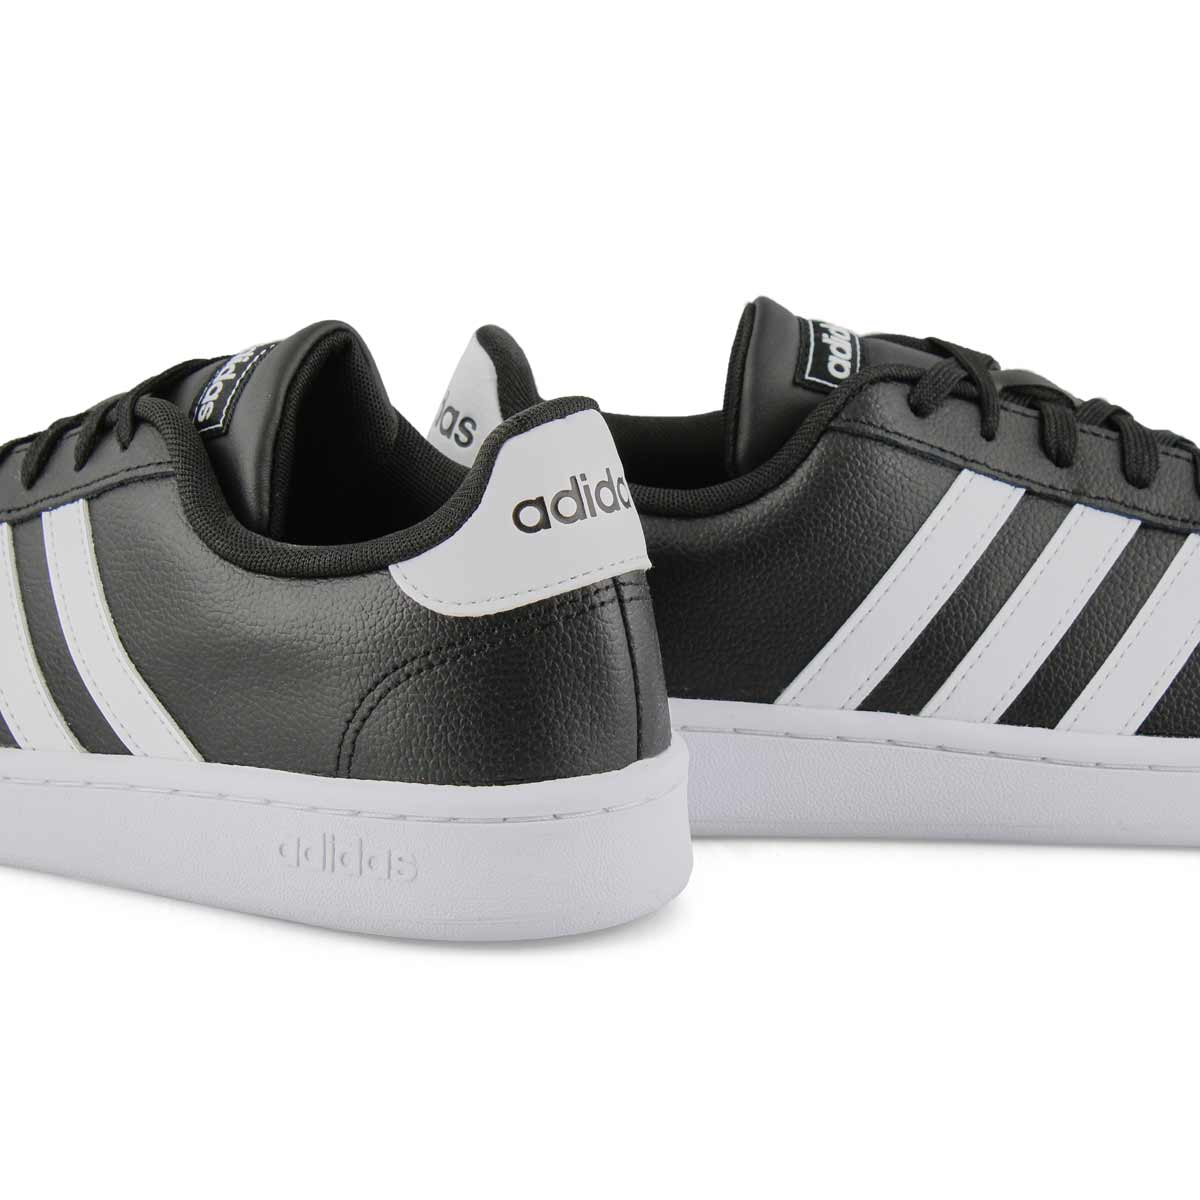 Mns Grand Court blk/wht sneaker